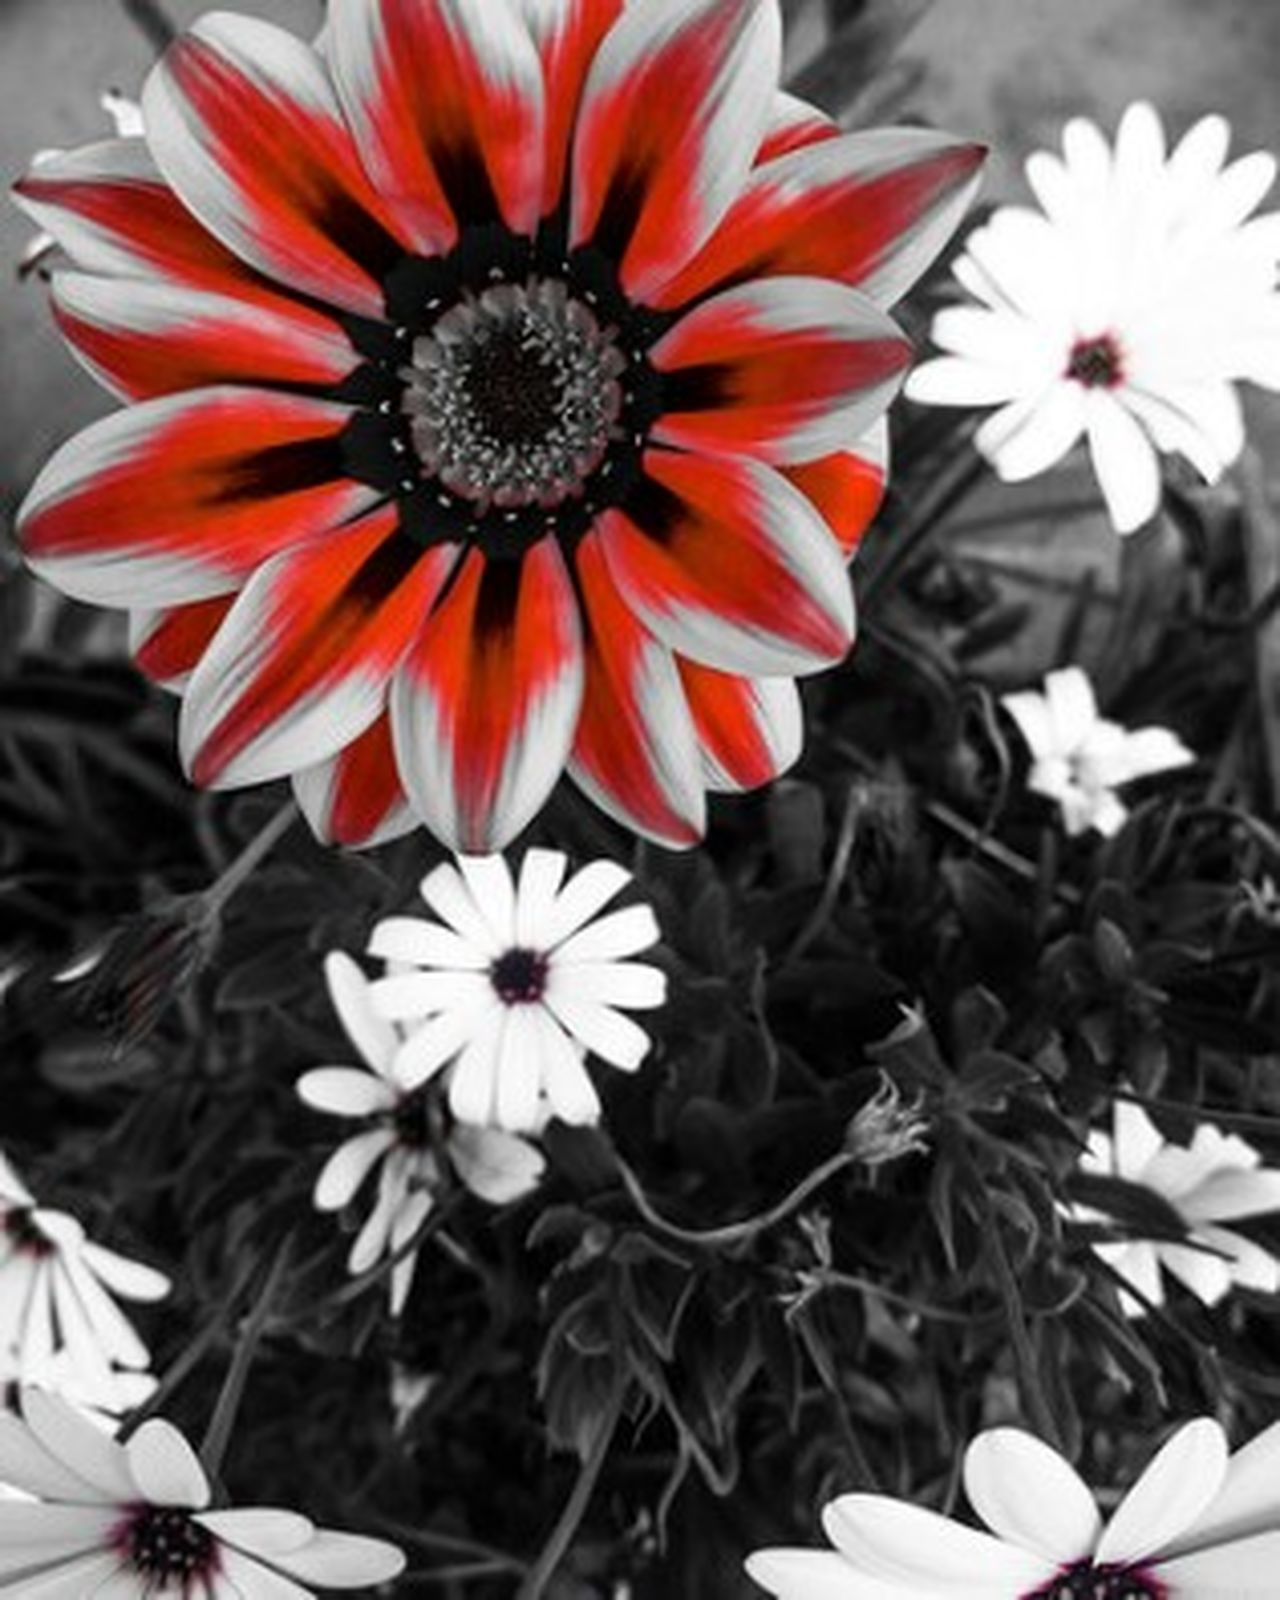 Flower Power 2 - Flower Spring Red Blackandwhite PtOlix Justforfun